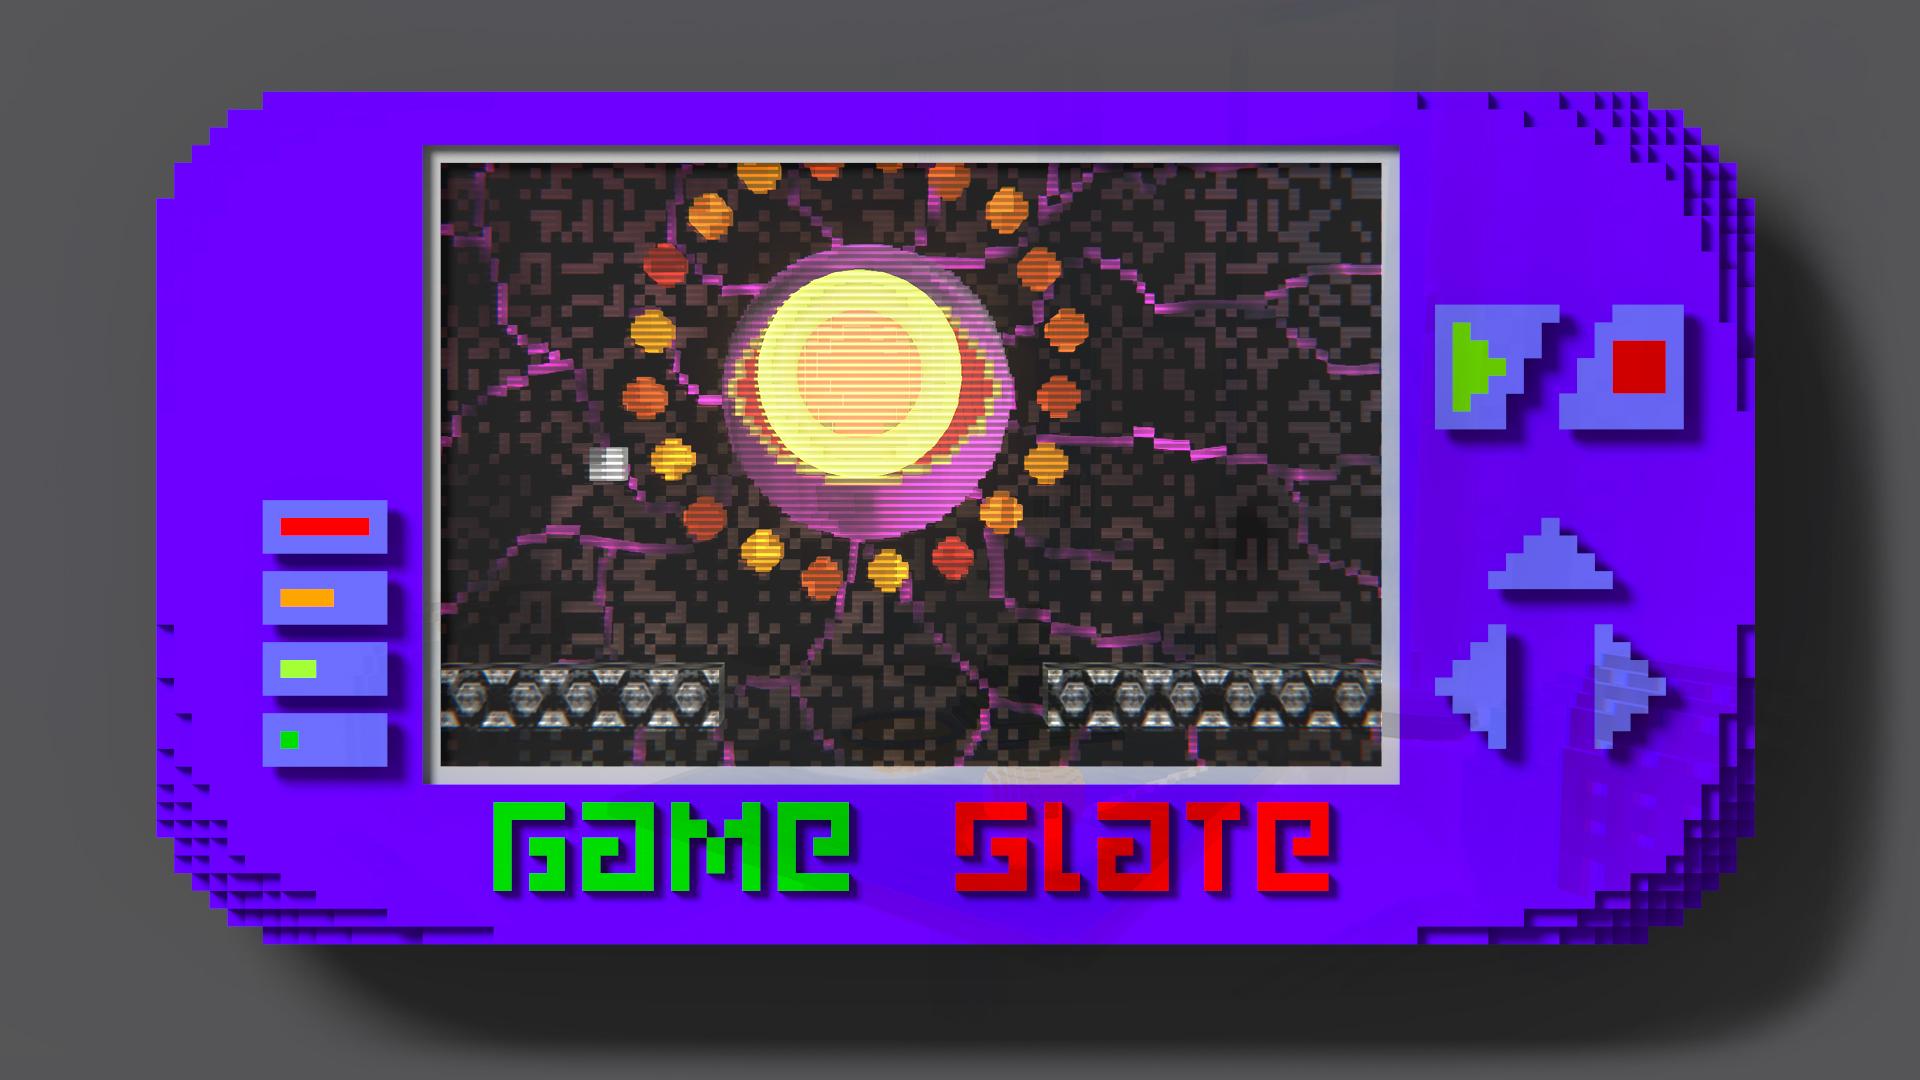 GameSlate (of Darkness)